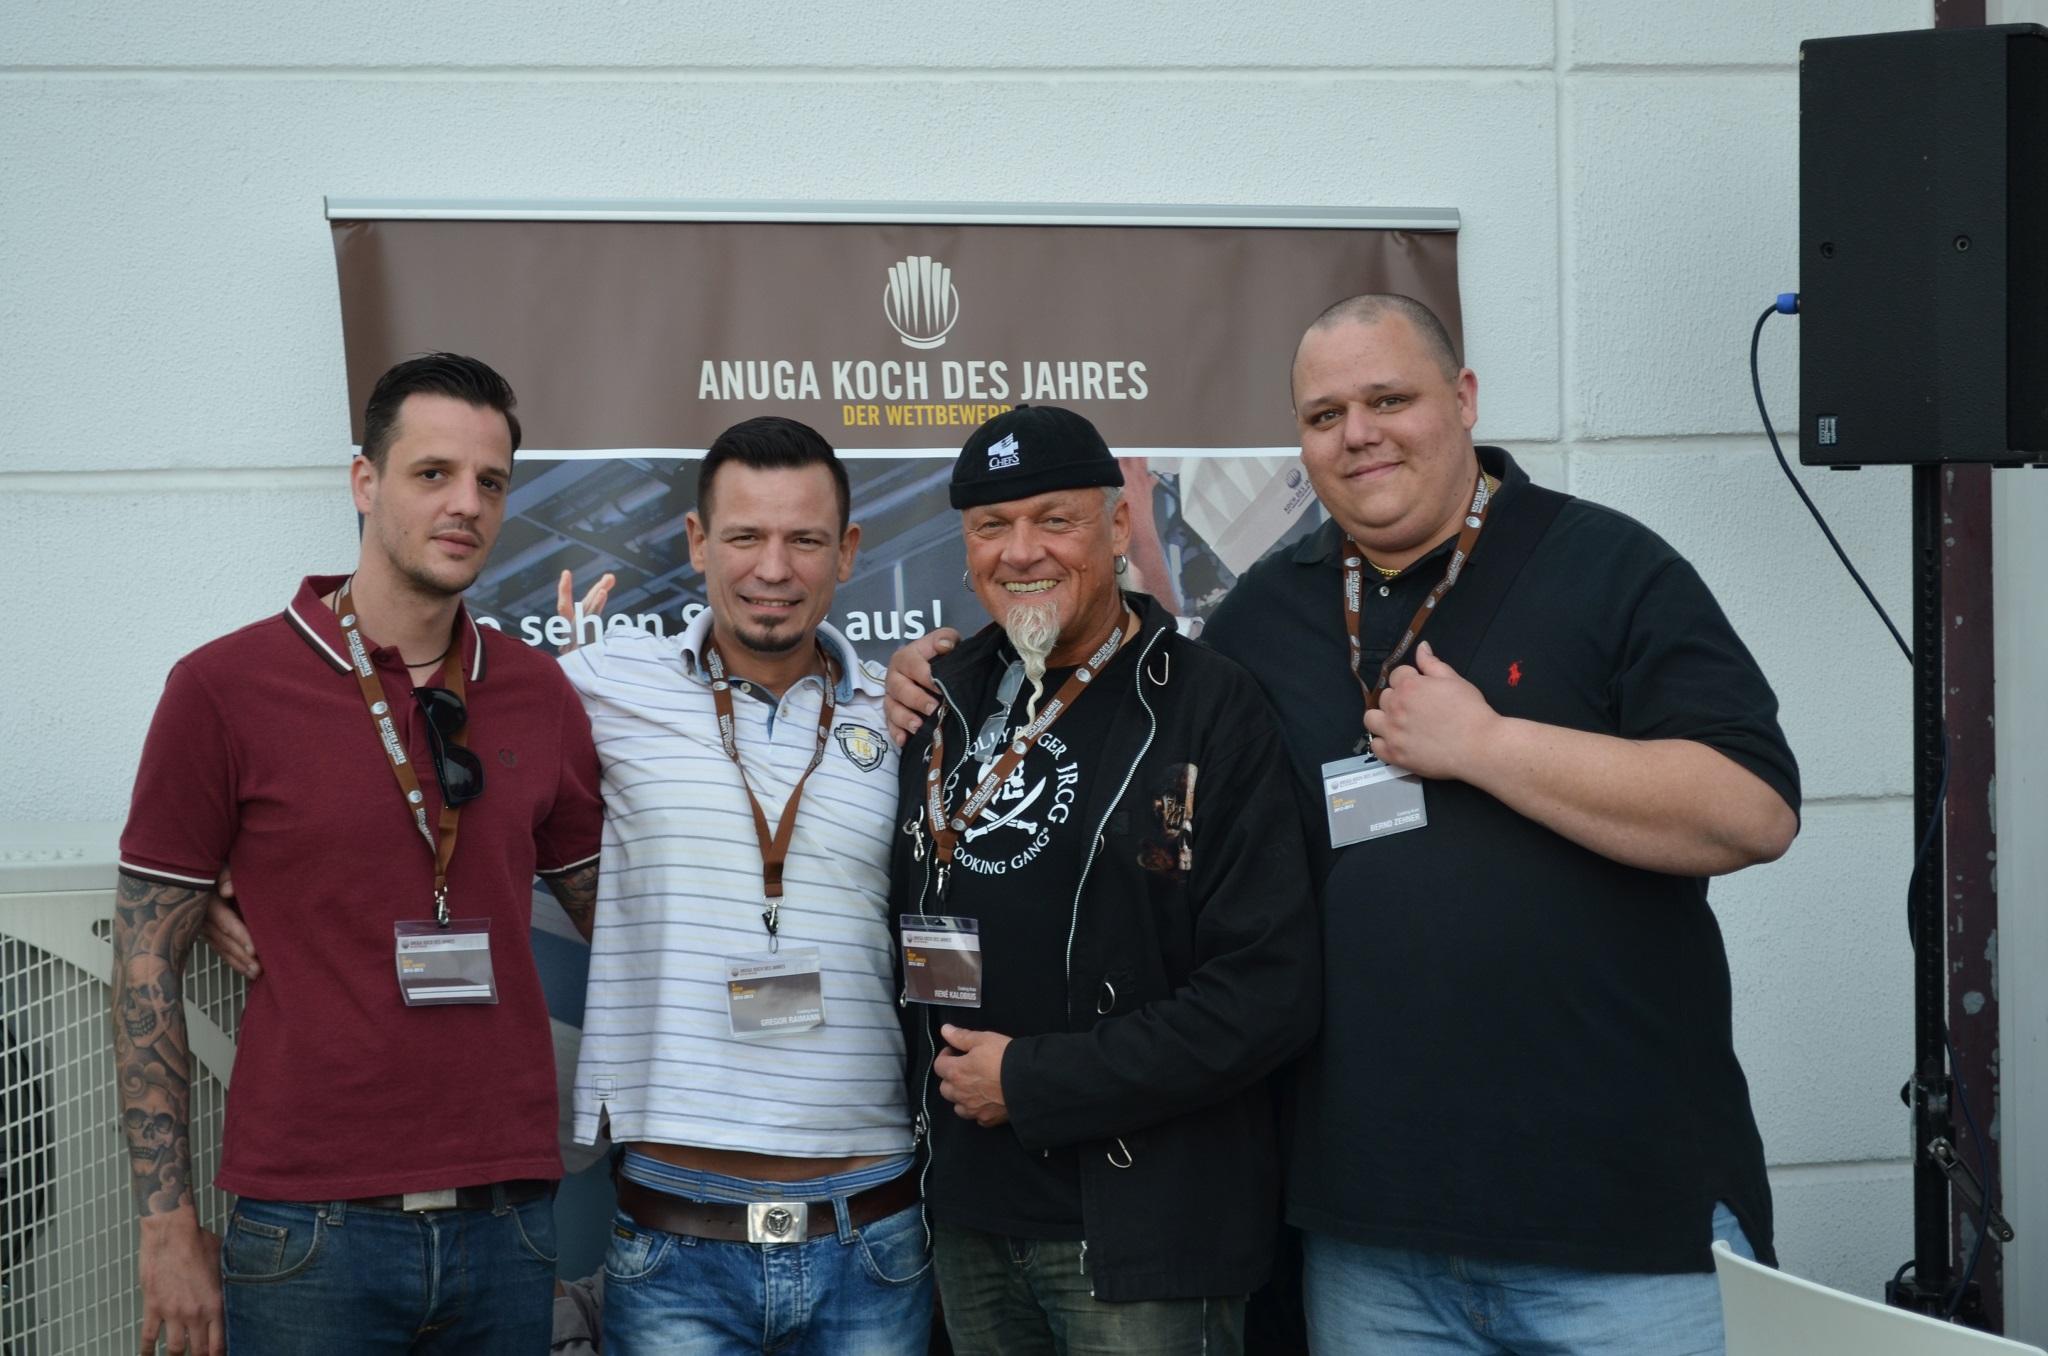 Cooking Aces bei Koch des Jahres in Köln. Sebastian Franke, Gregor Raimann, René Kalobius und Bernd Zehner